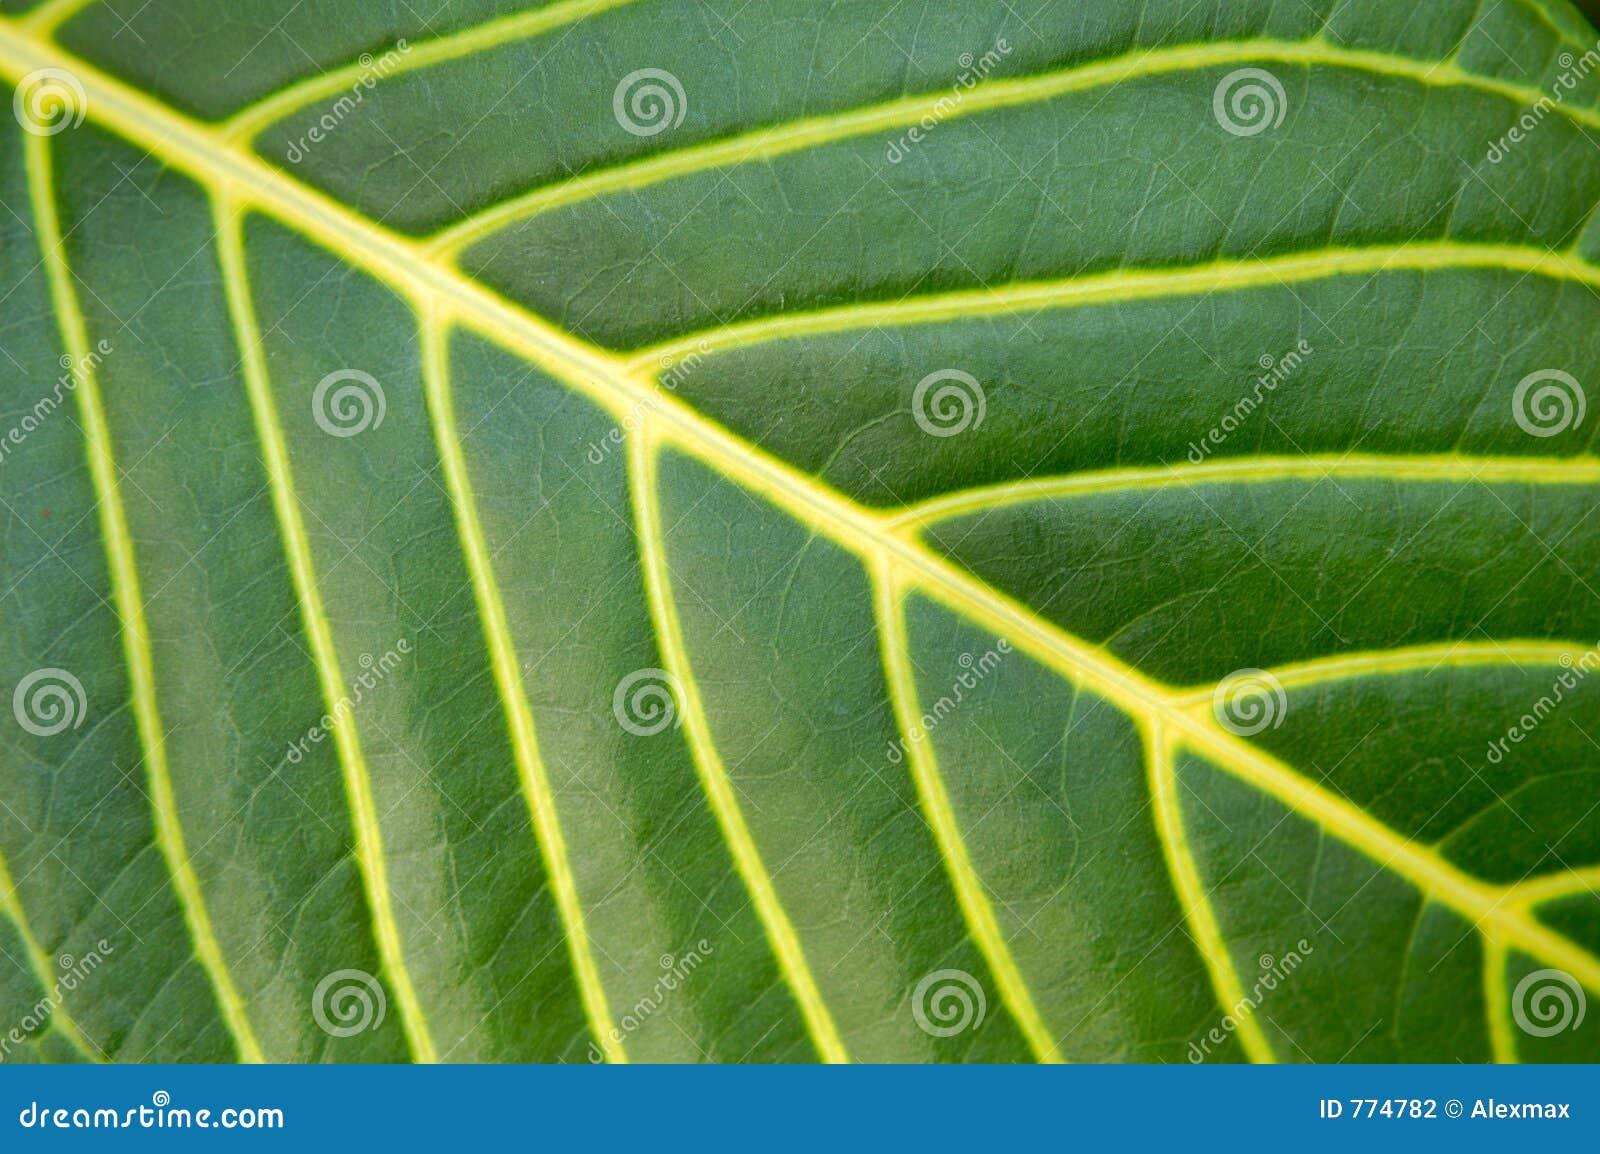 Big Green Plant Leaf Macro Stock Photography Image 774782